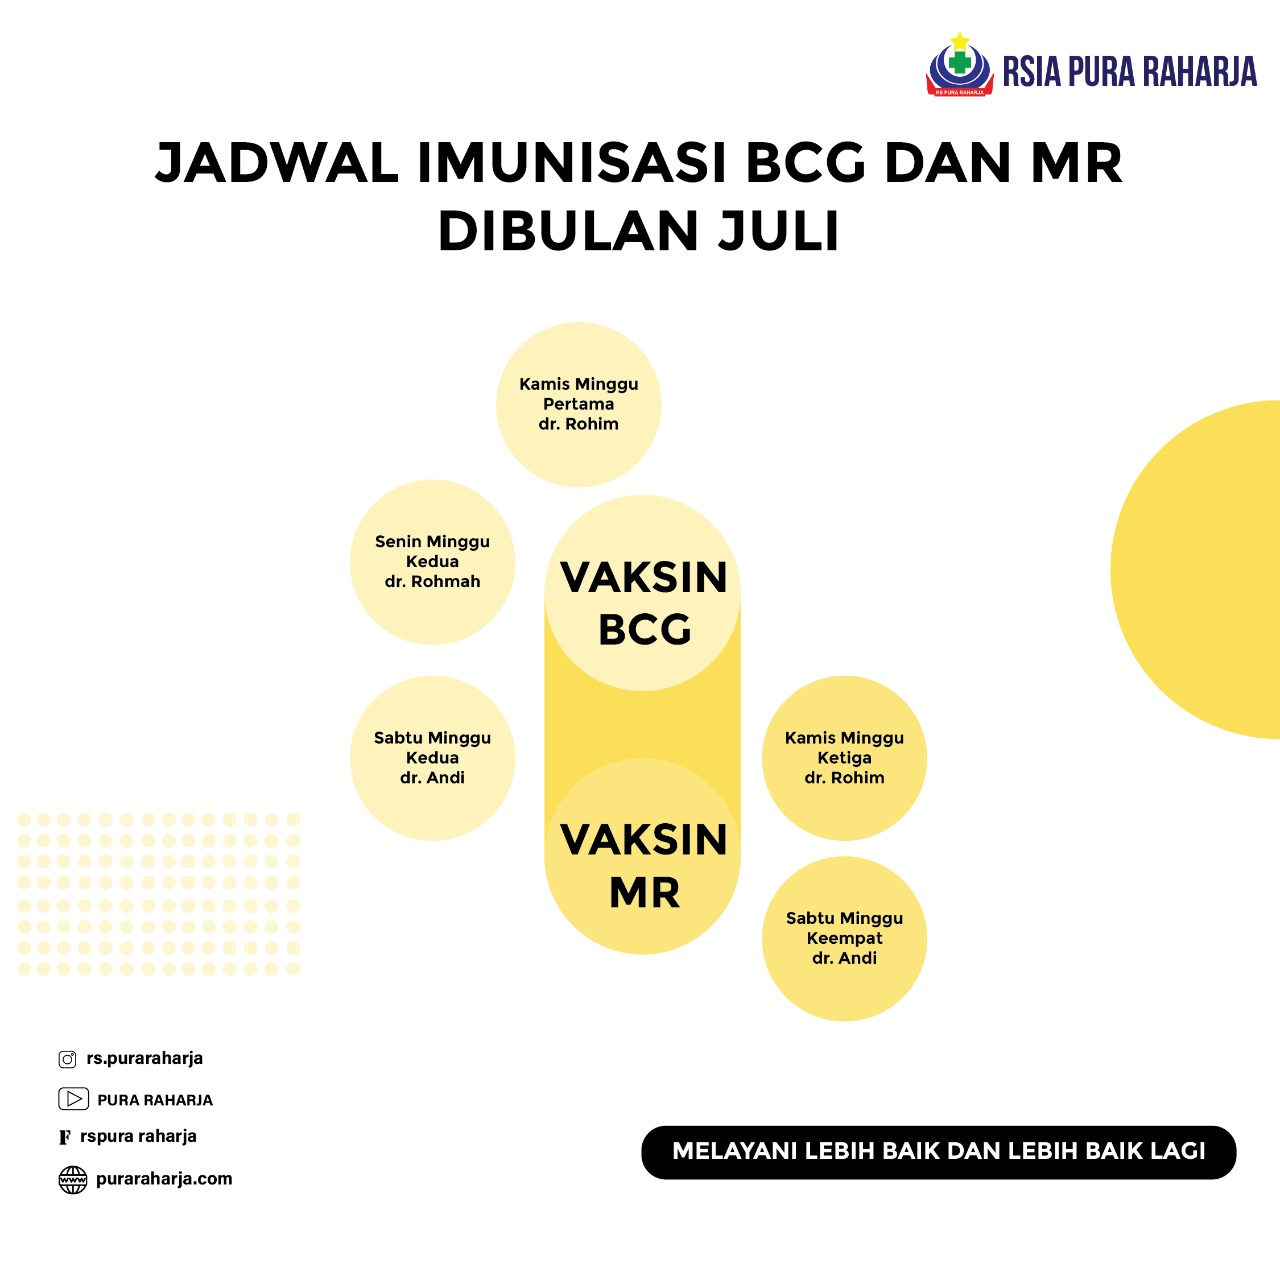 Si Kecil sudah imunisasi MR dan BCG, yuk intip